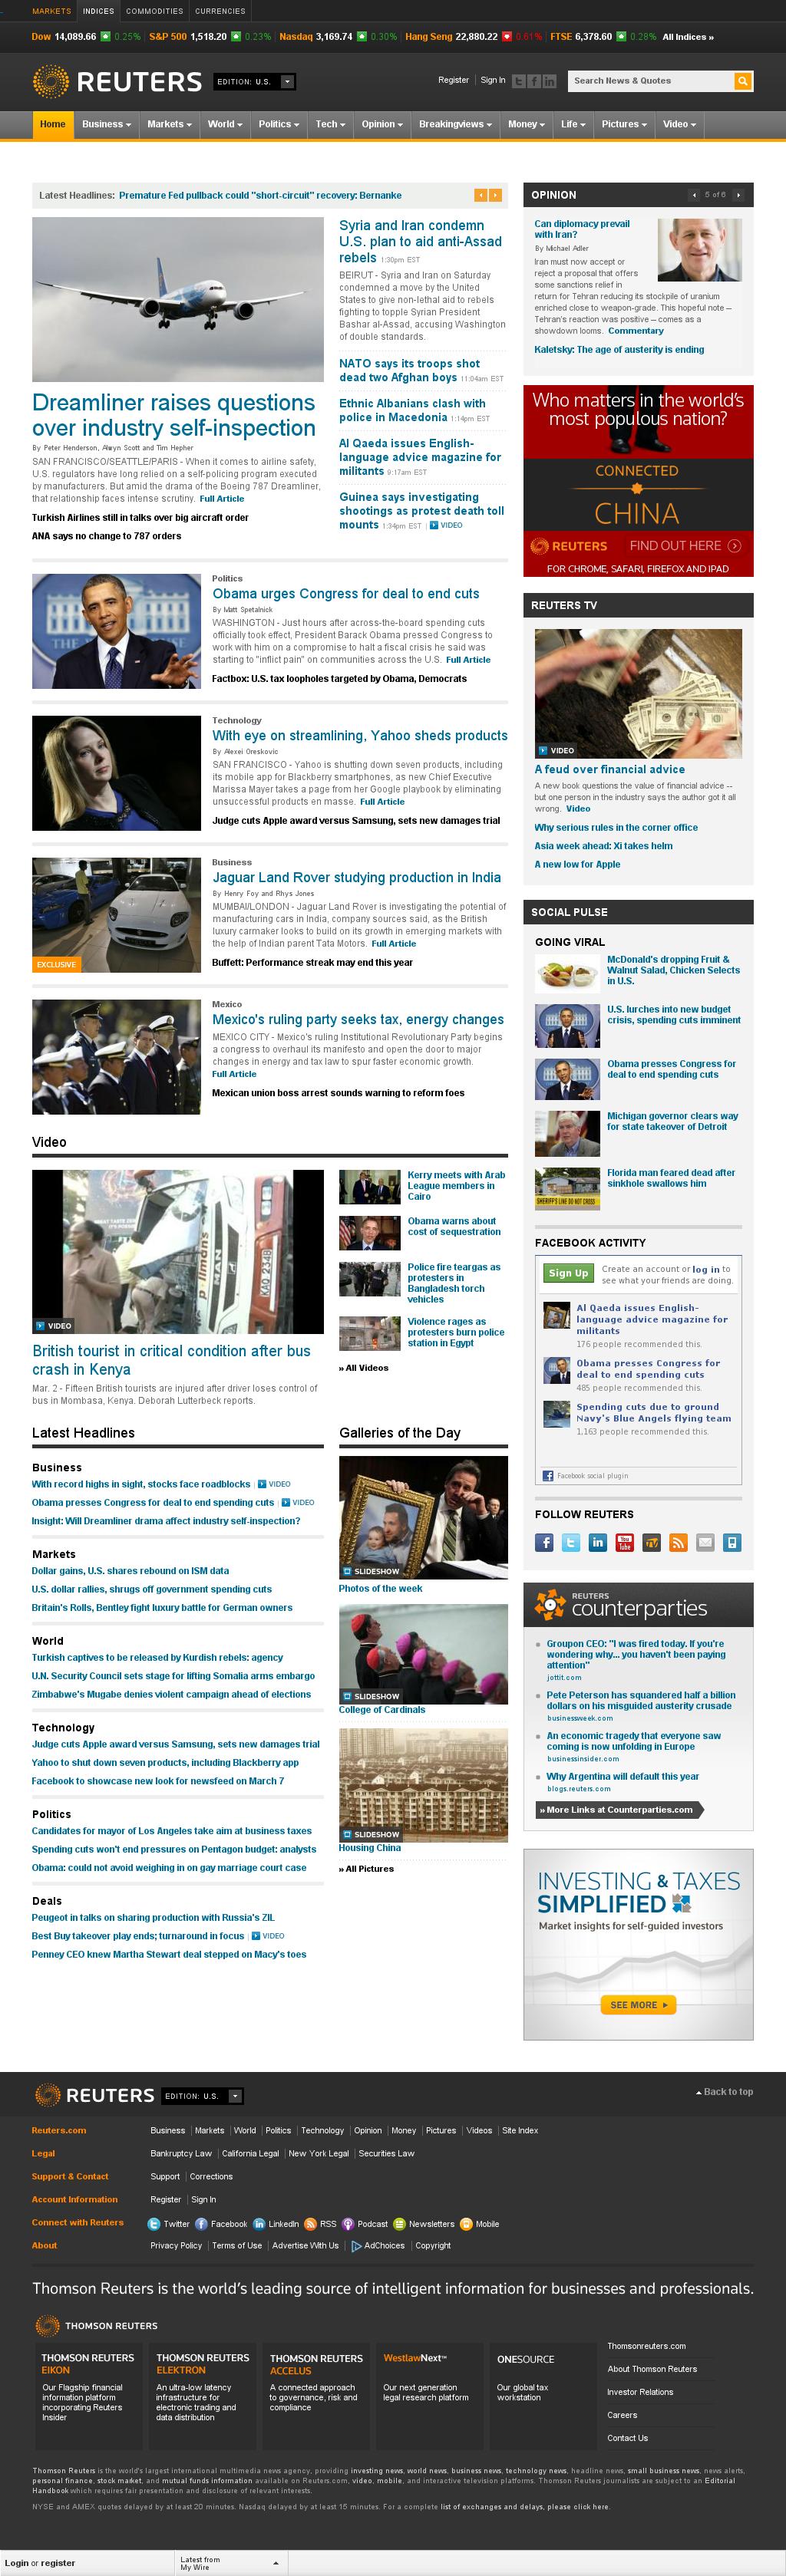 Reuters at Saturday March 2, 2013, 7:17 p.m. UTC